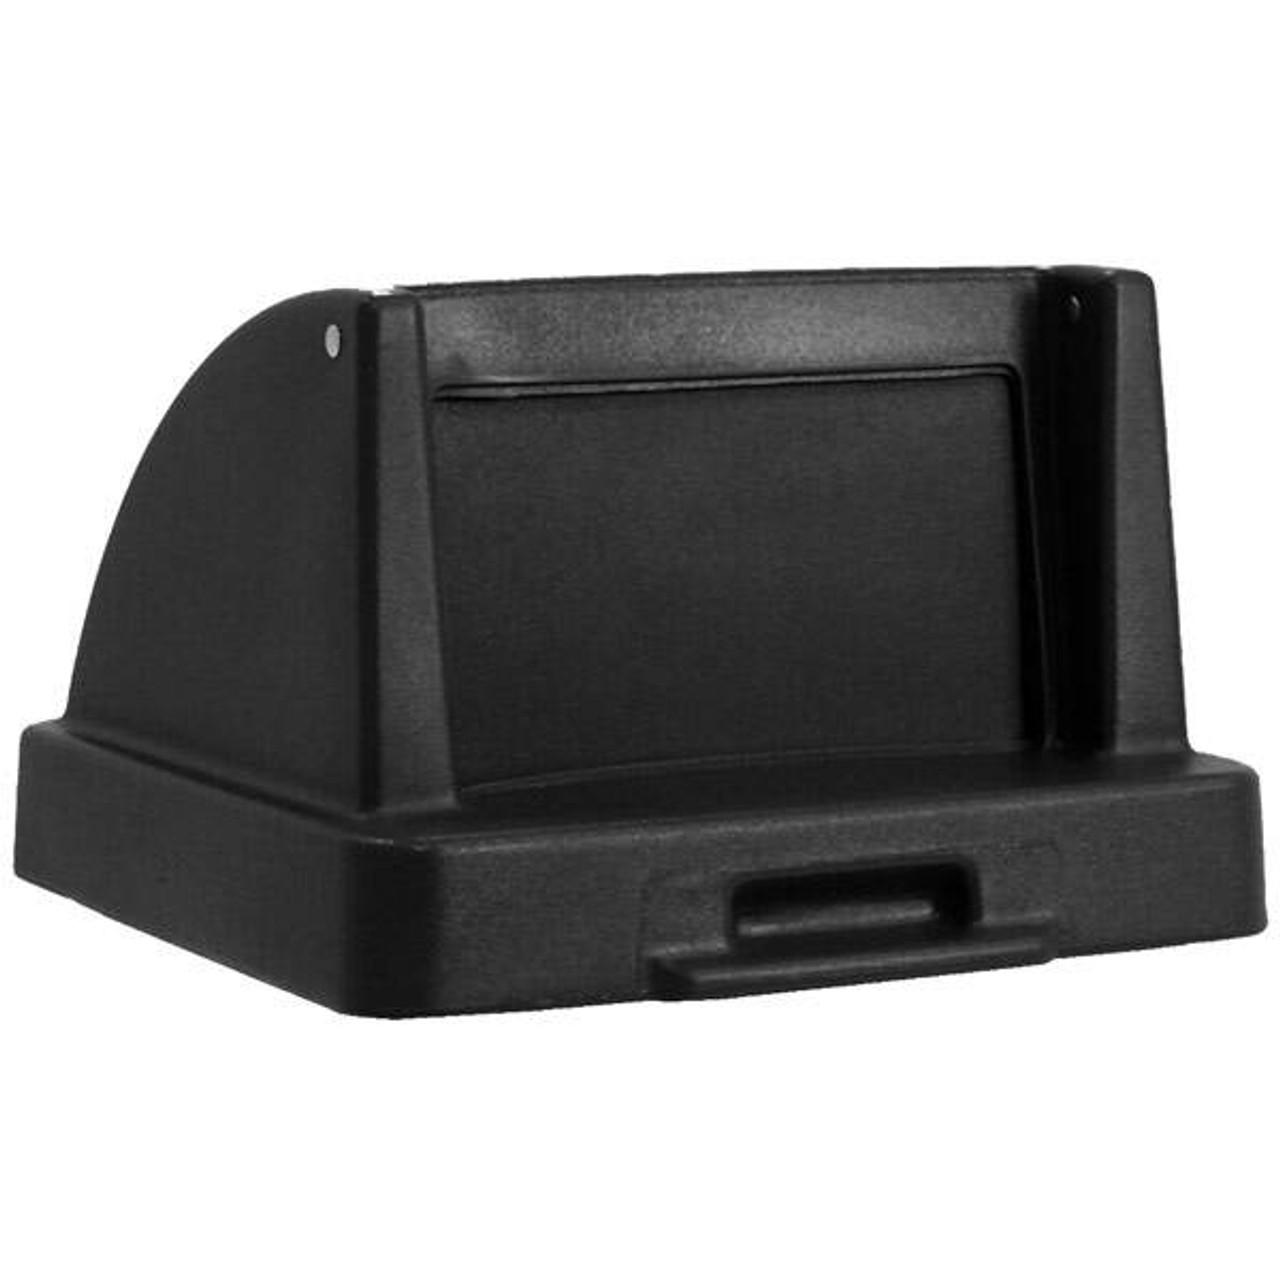 20.5 x 20.5 Push Door Plastic Lids TF1405QS for Square Trash Cans Black